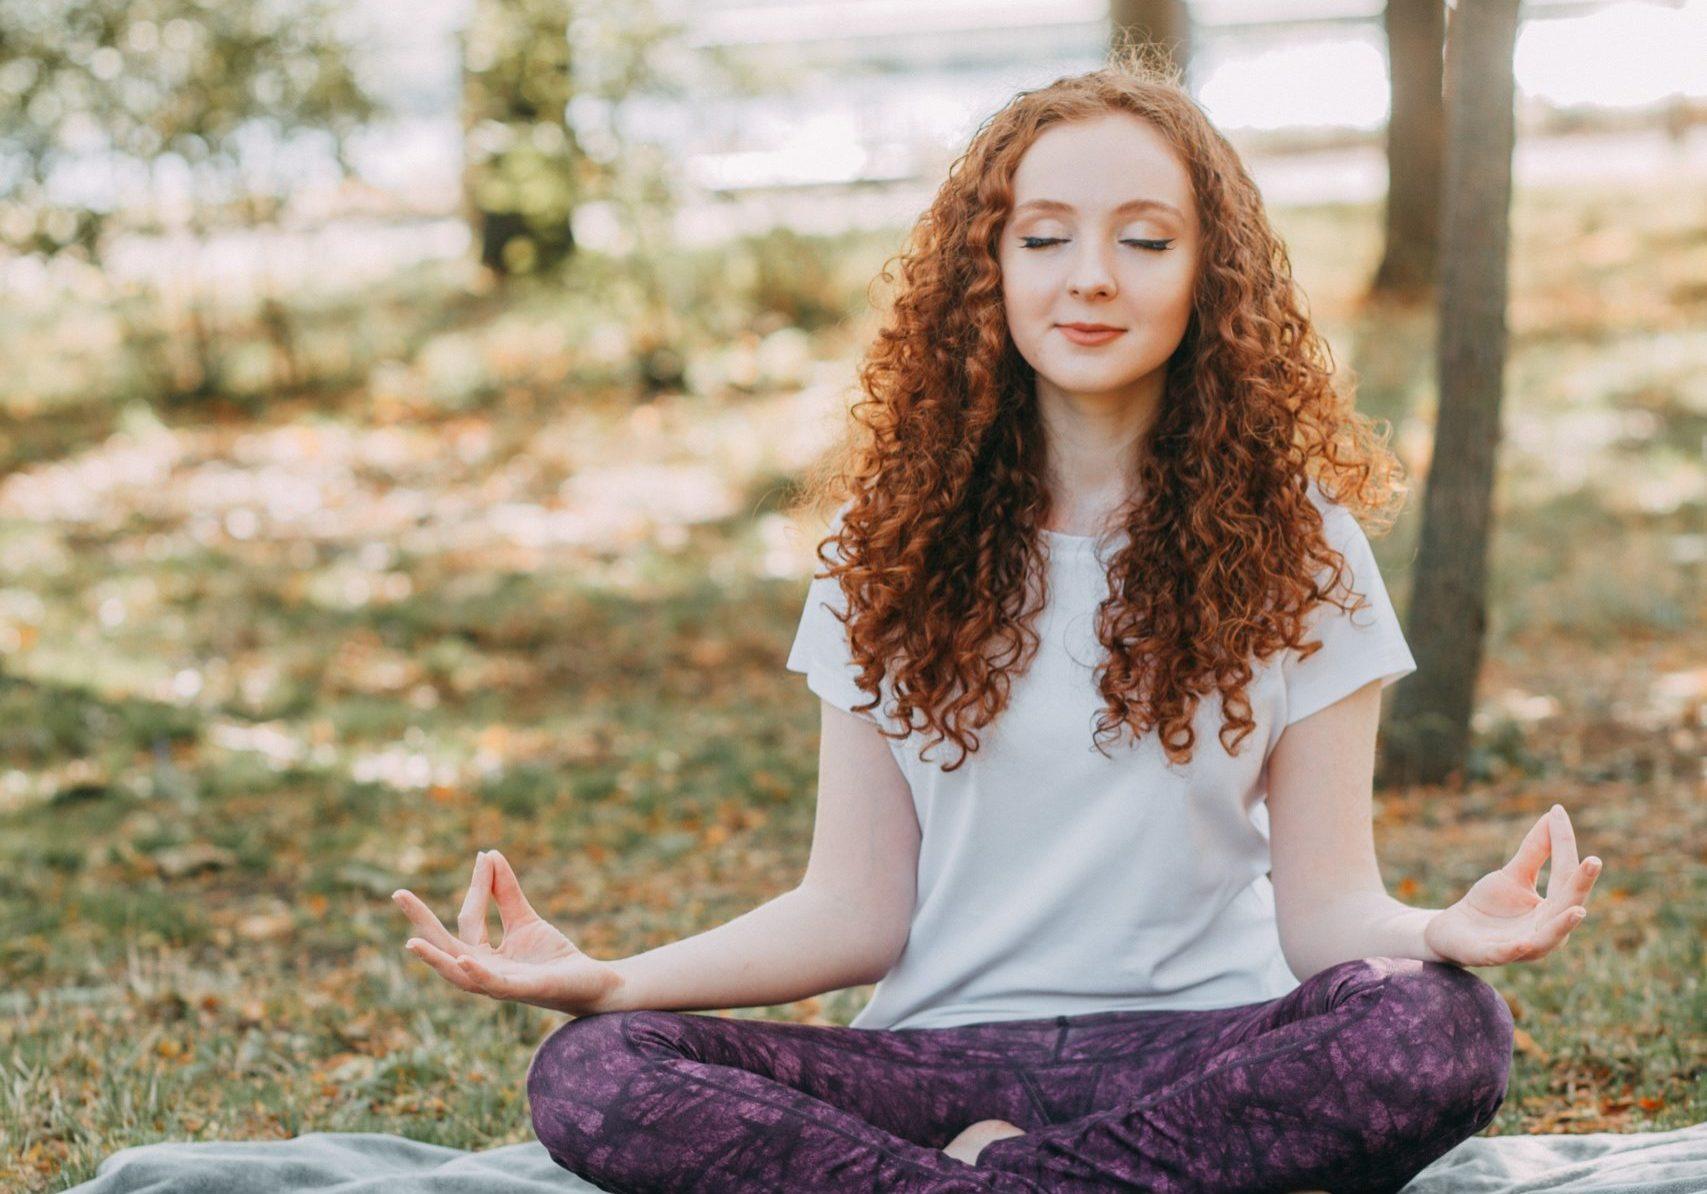 photo-of-woman-meditating-3759657.jpg